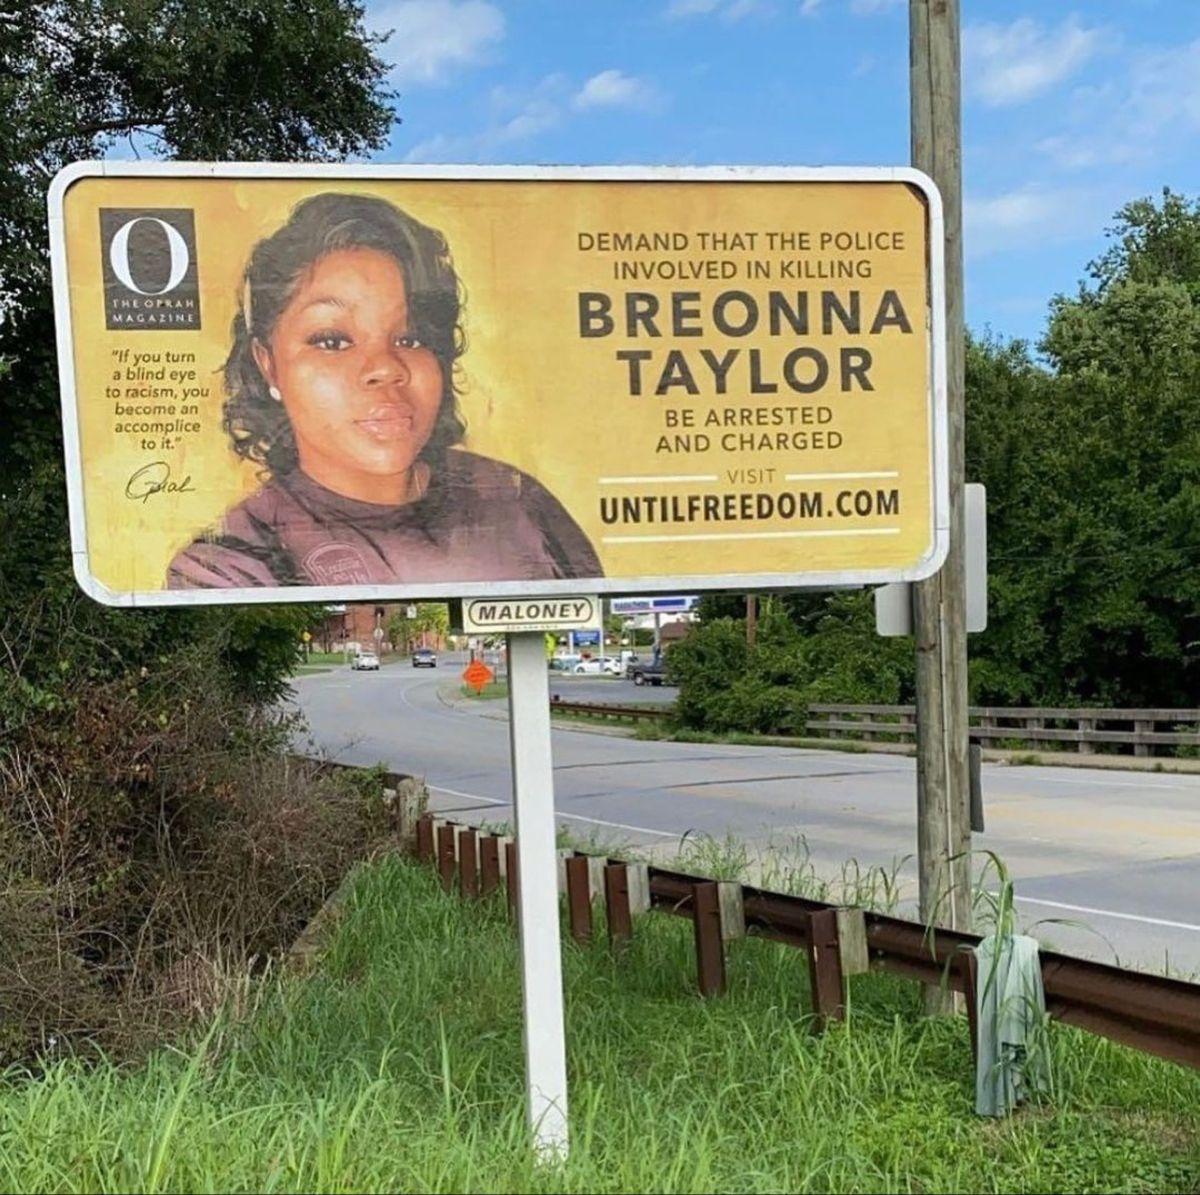 Breonna Taylor In 2020 Say Her Name Oprah Billboard